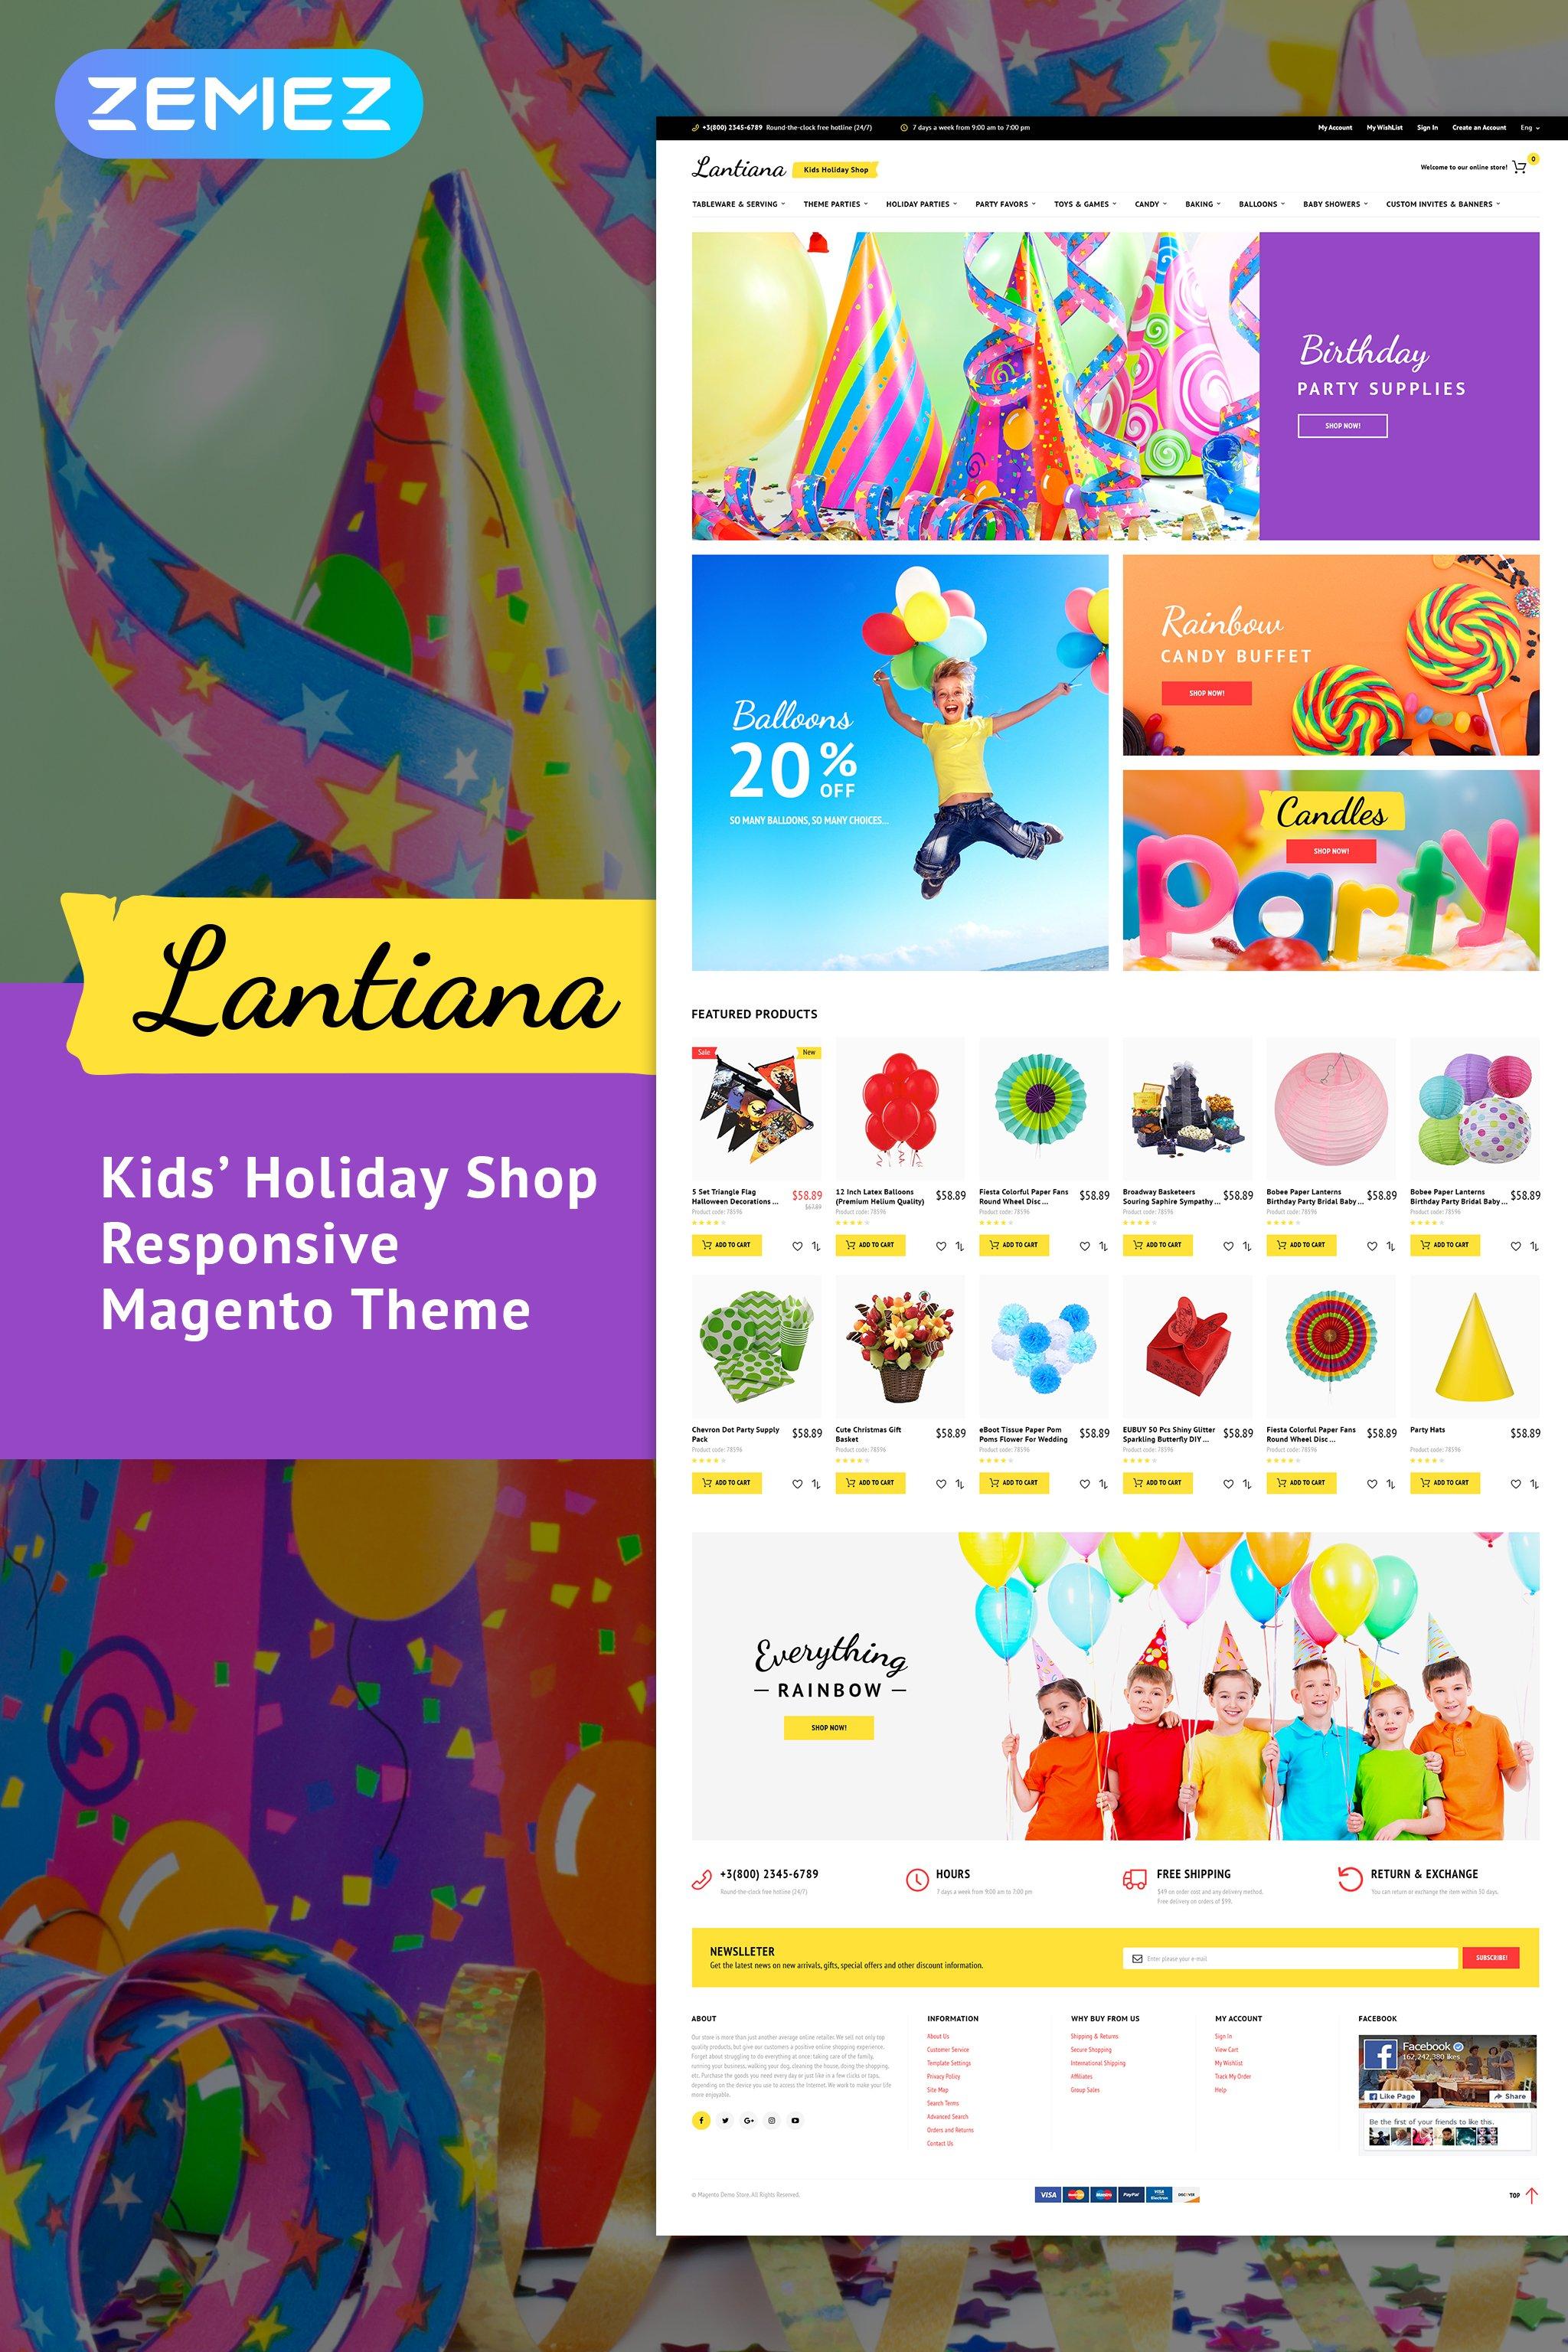 Reszponzív Lantiana - Party Supplies Magento sablon 62095